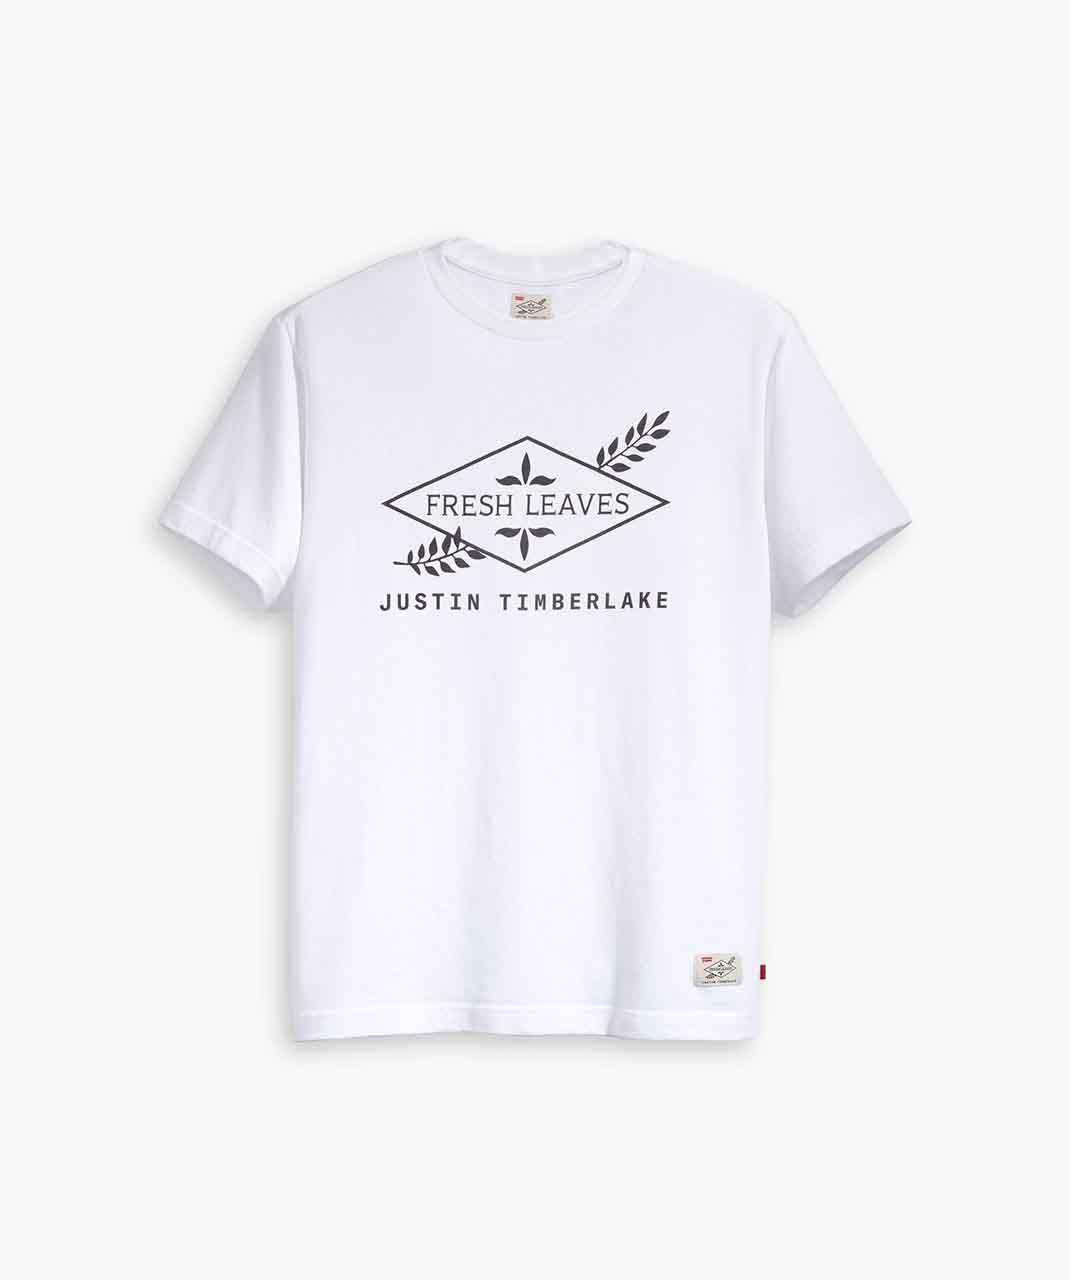 thuong hieu levi's x ca si justin timberlake - elle man (10)_1